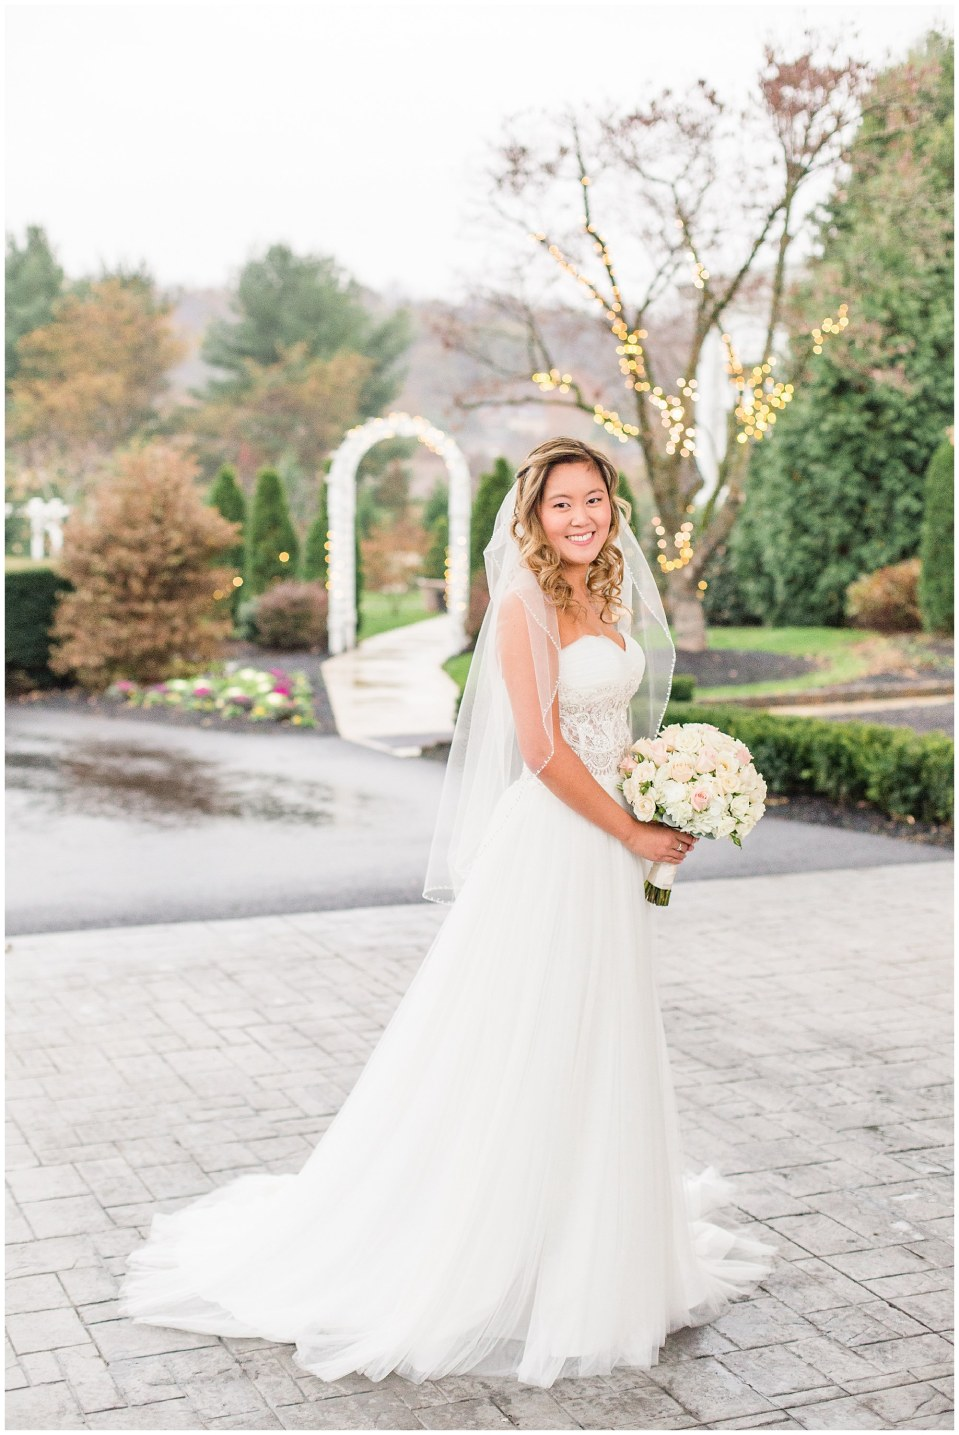 JD & Molly's Rainy Black Tie Wedding at The Warrington in Warrington, Pennsylvania Photos_0031.jpg